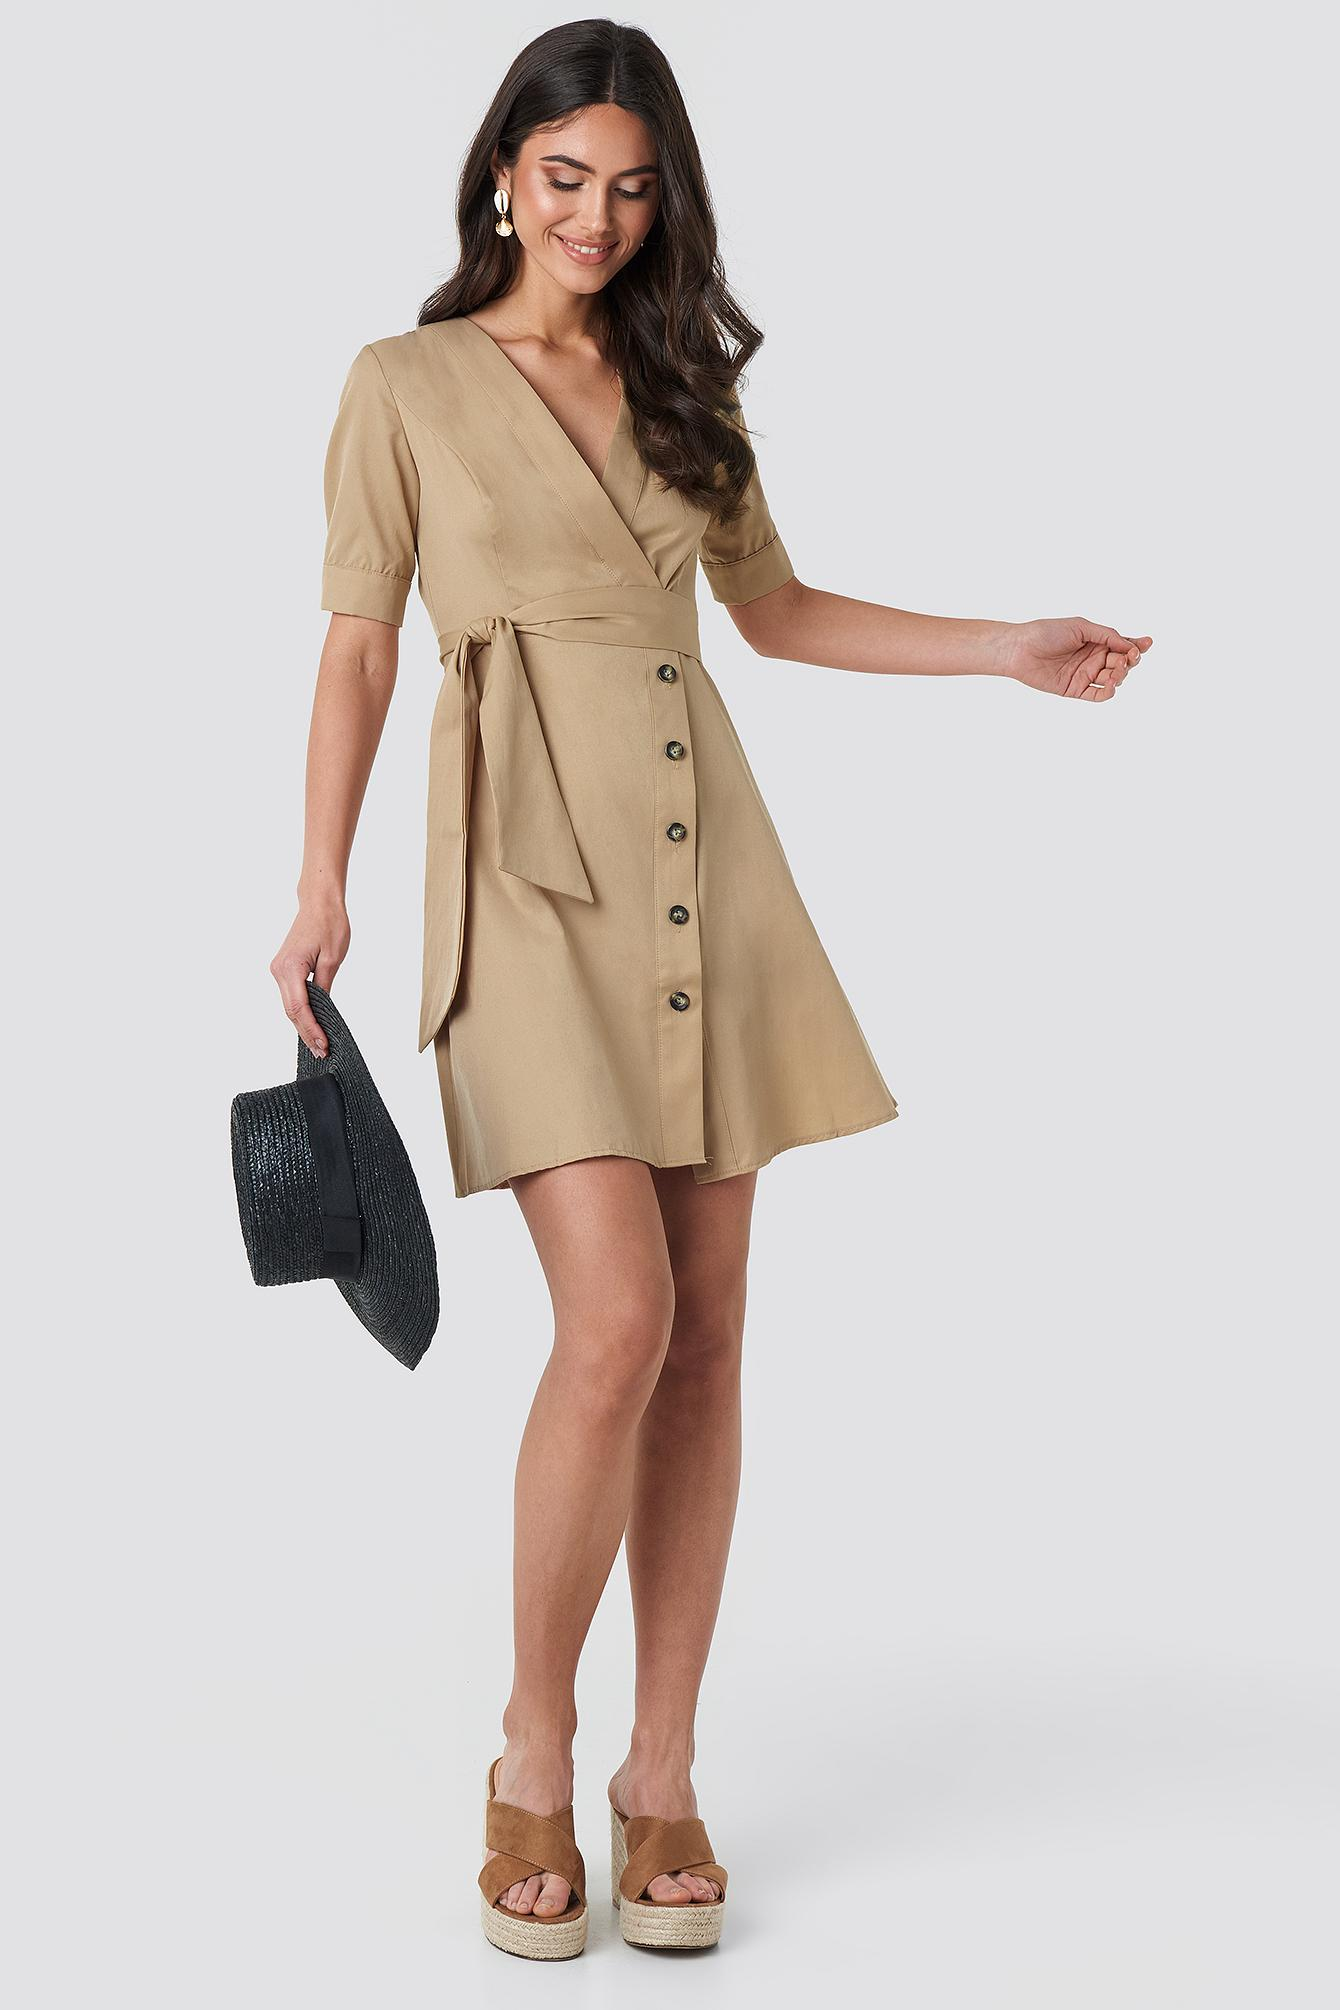 Asymmetric Buttoned Mini Dress Coton NA-KD en coloris Neutre